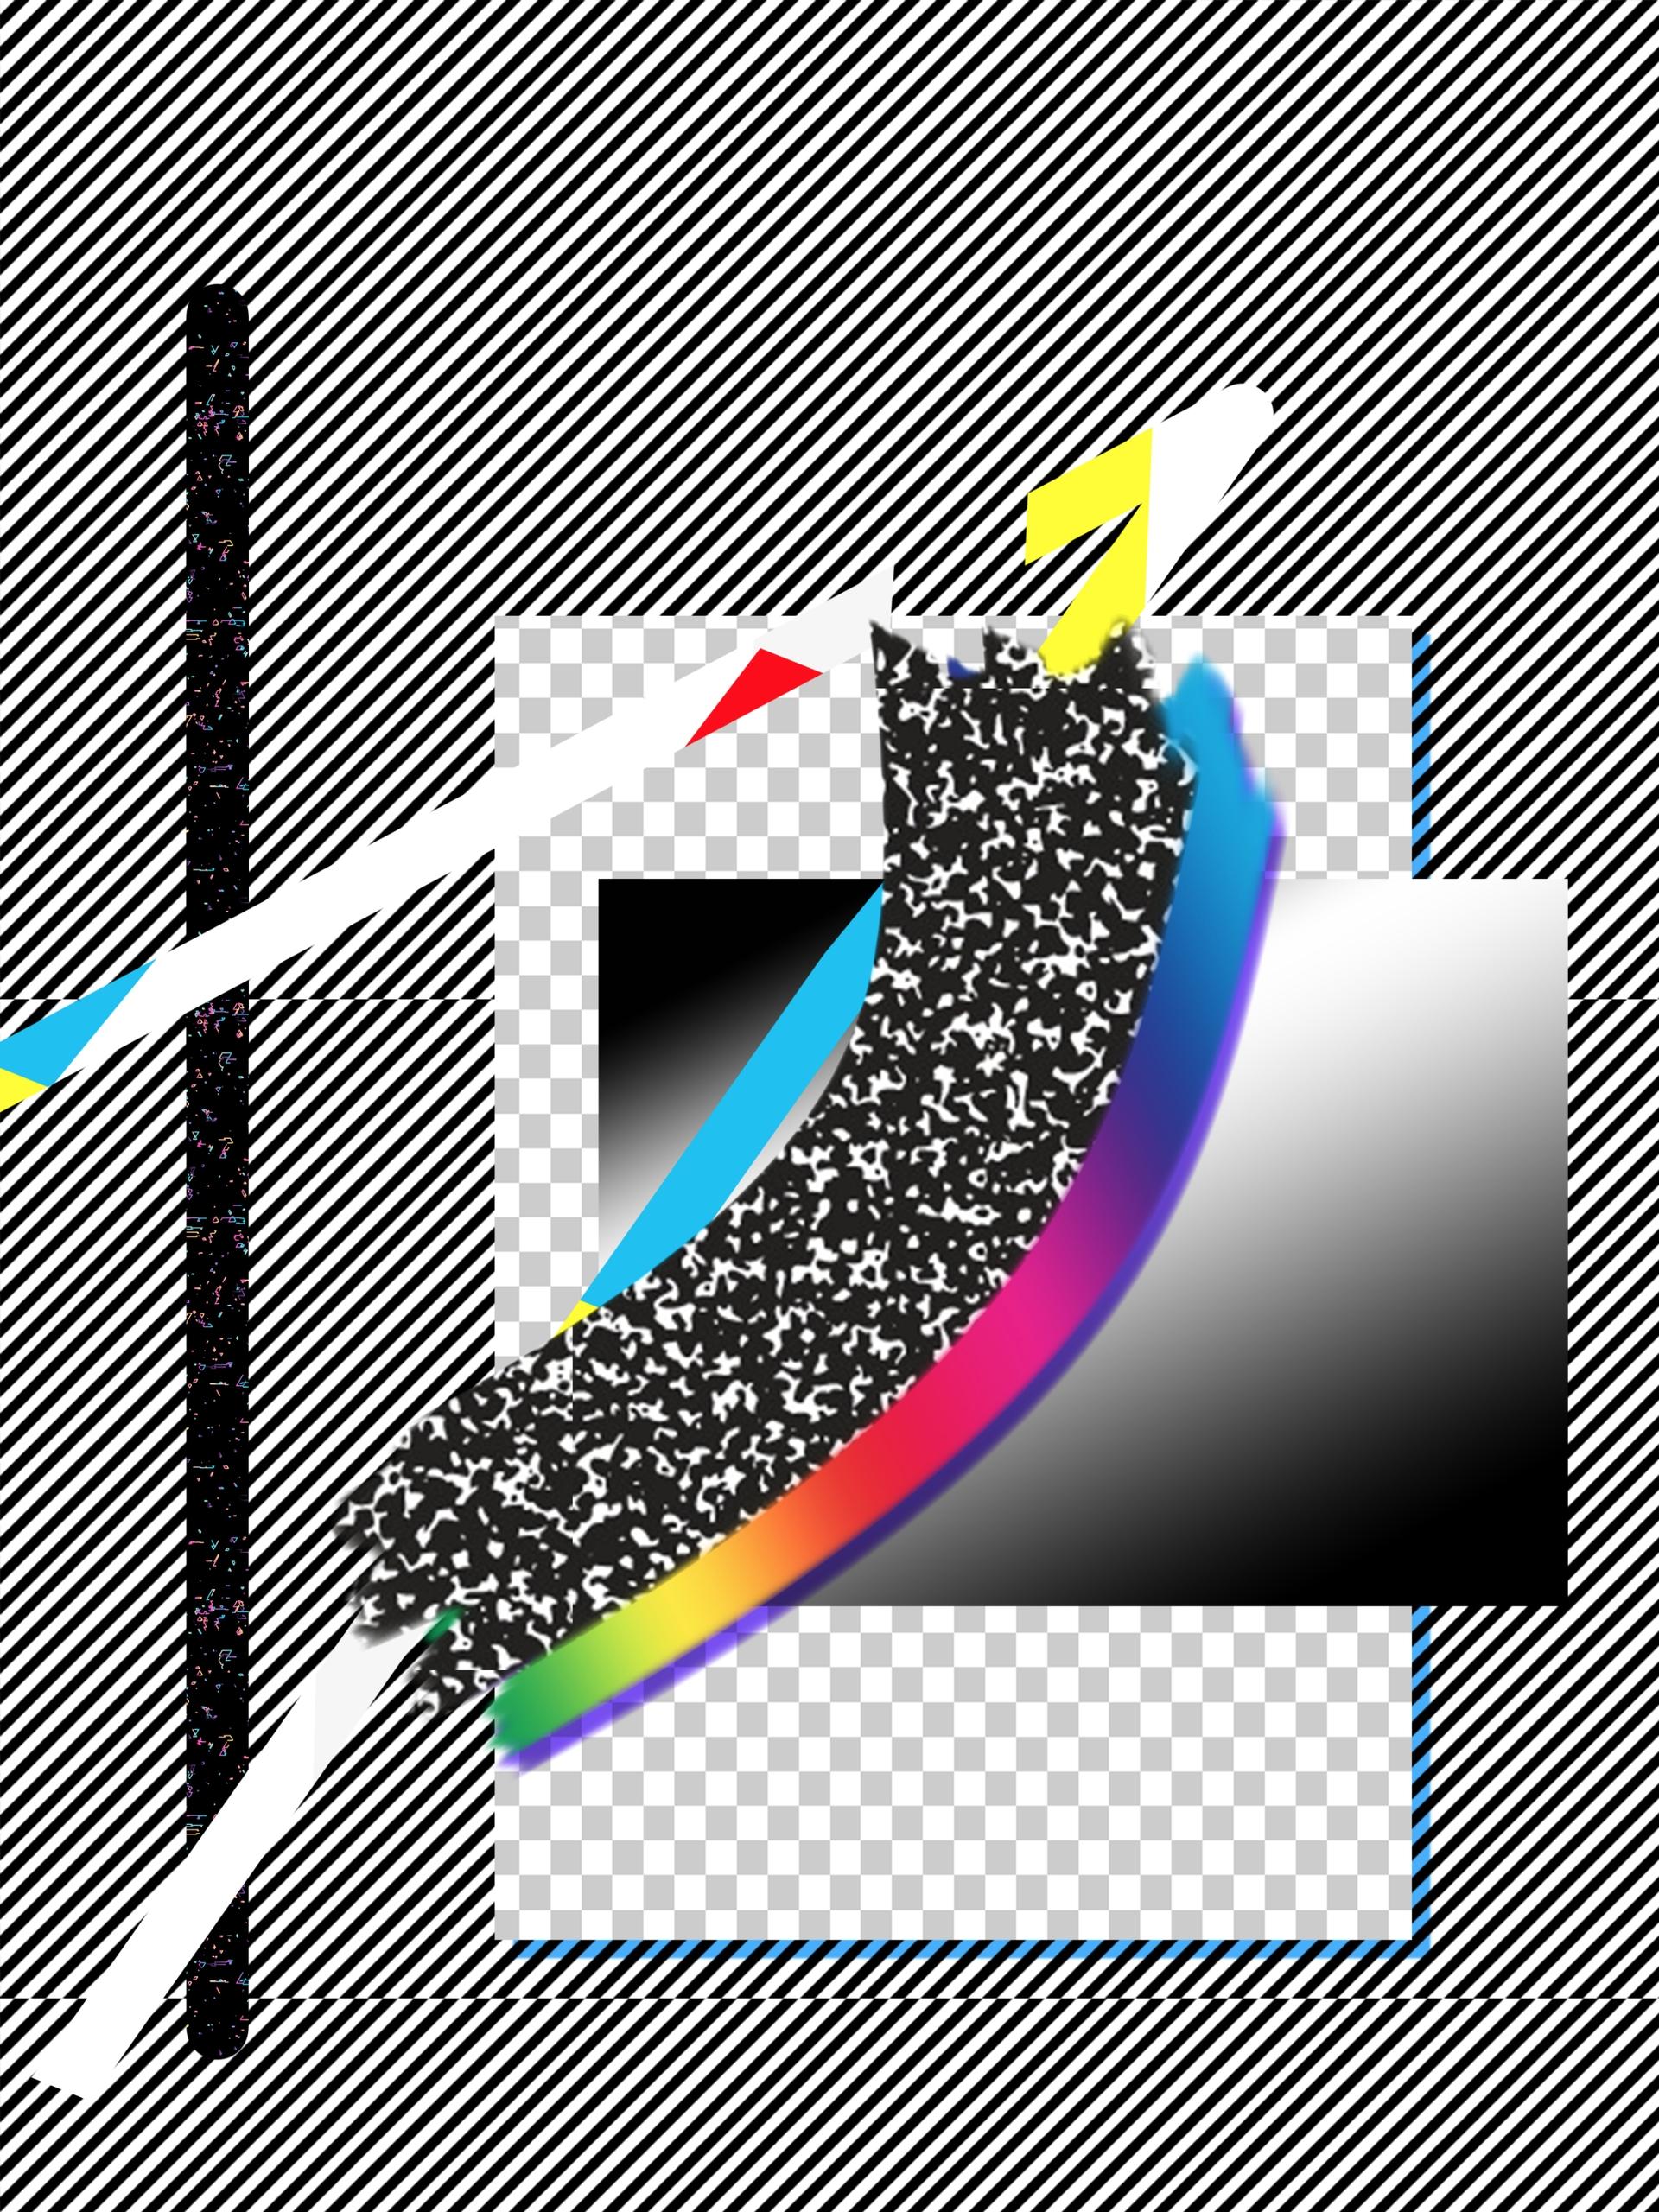 doodles today. ⚡️💫📈 • vaporwave - andrew_indelicato | ello